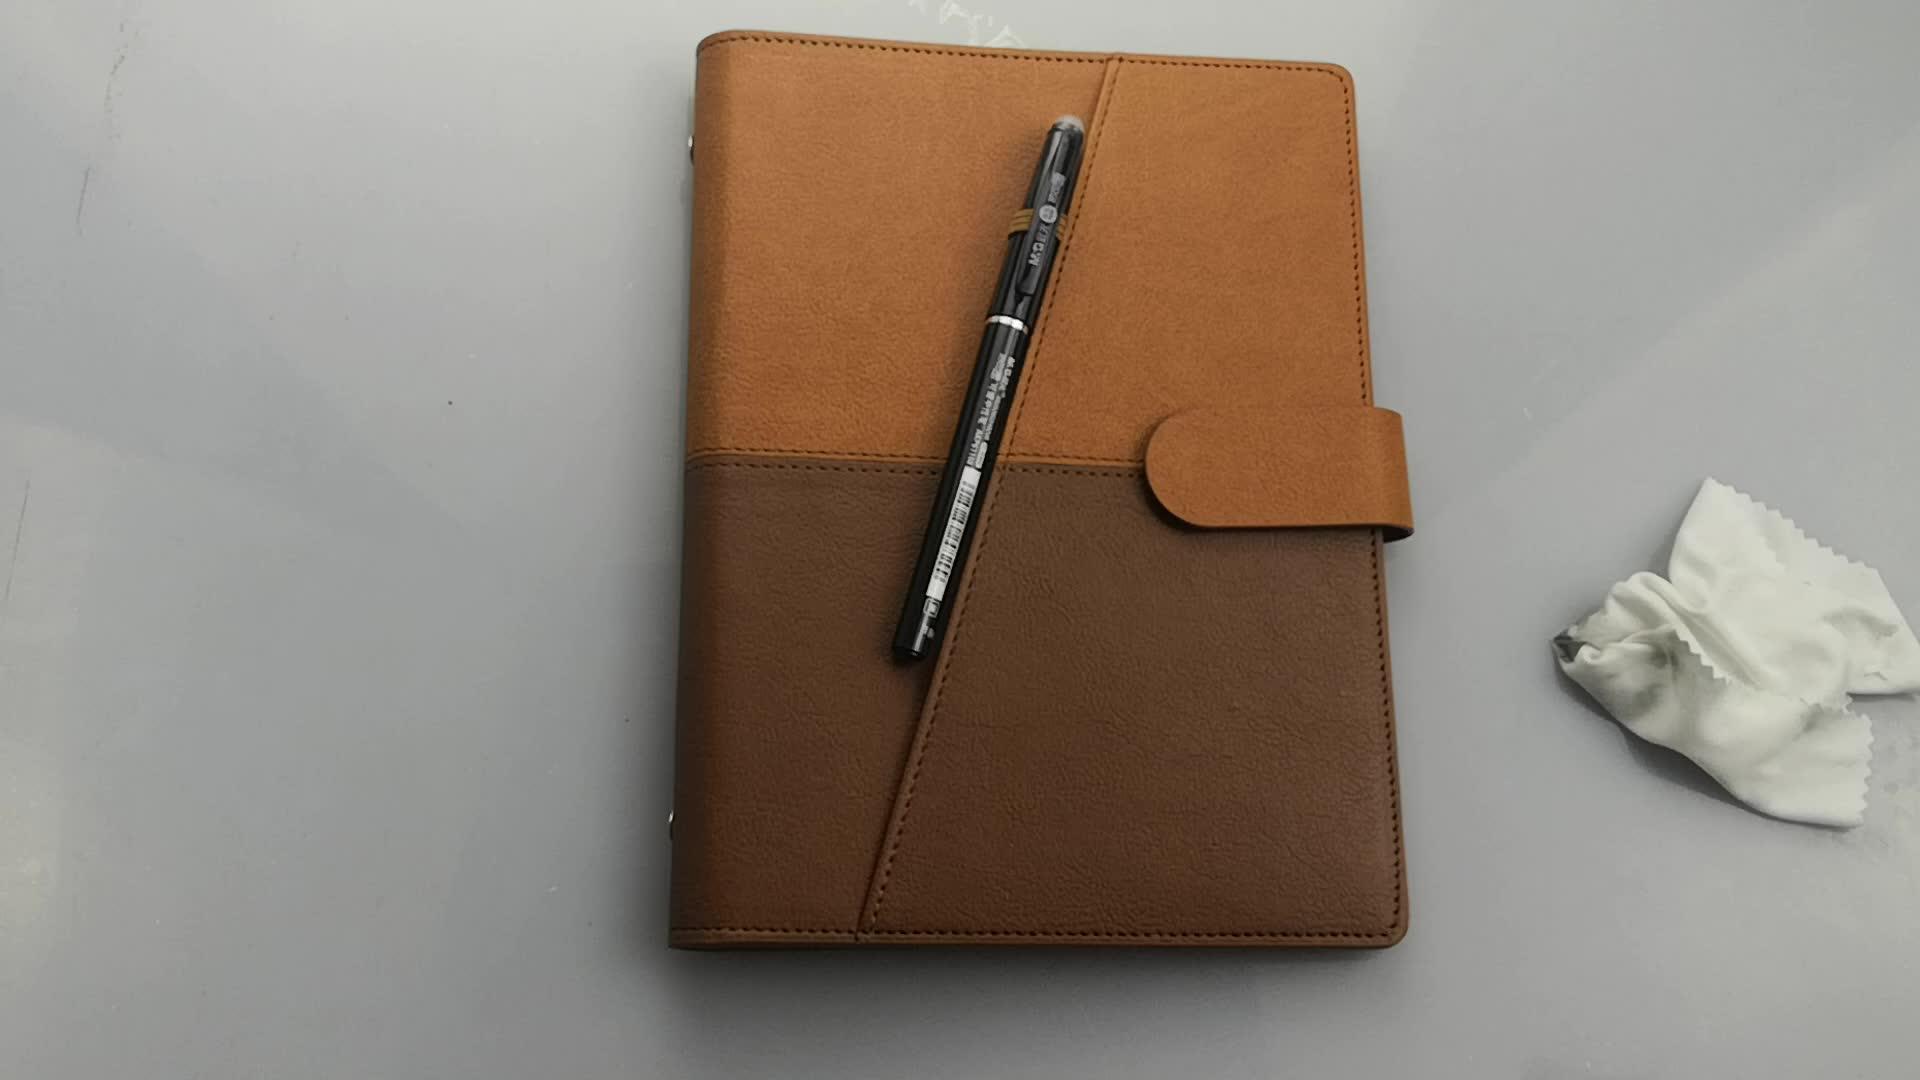 Newyes A5 หนังสือ Reusable Erasable โน้ตบุ๊คหนังไดอารี่ Office Smart Planner โลโก้